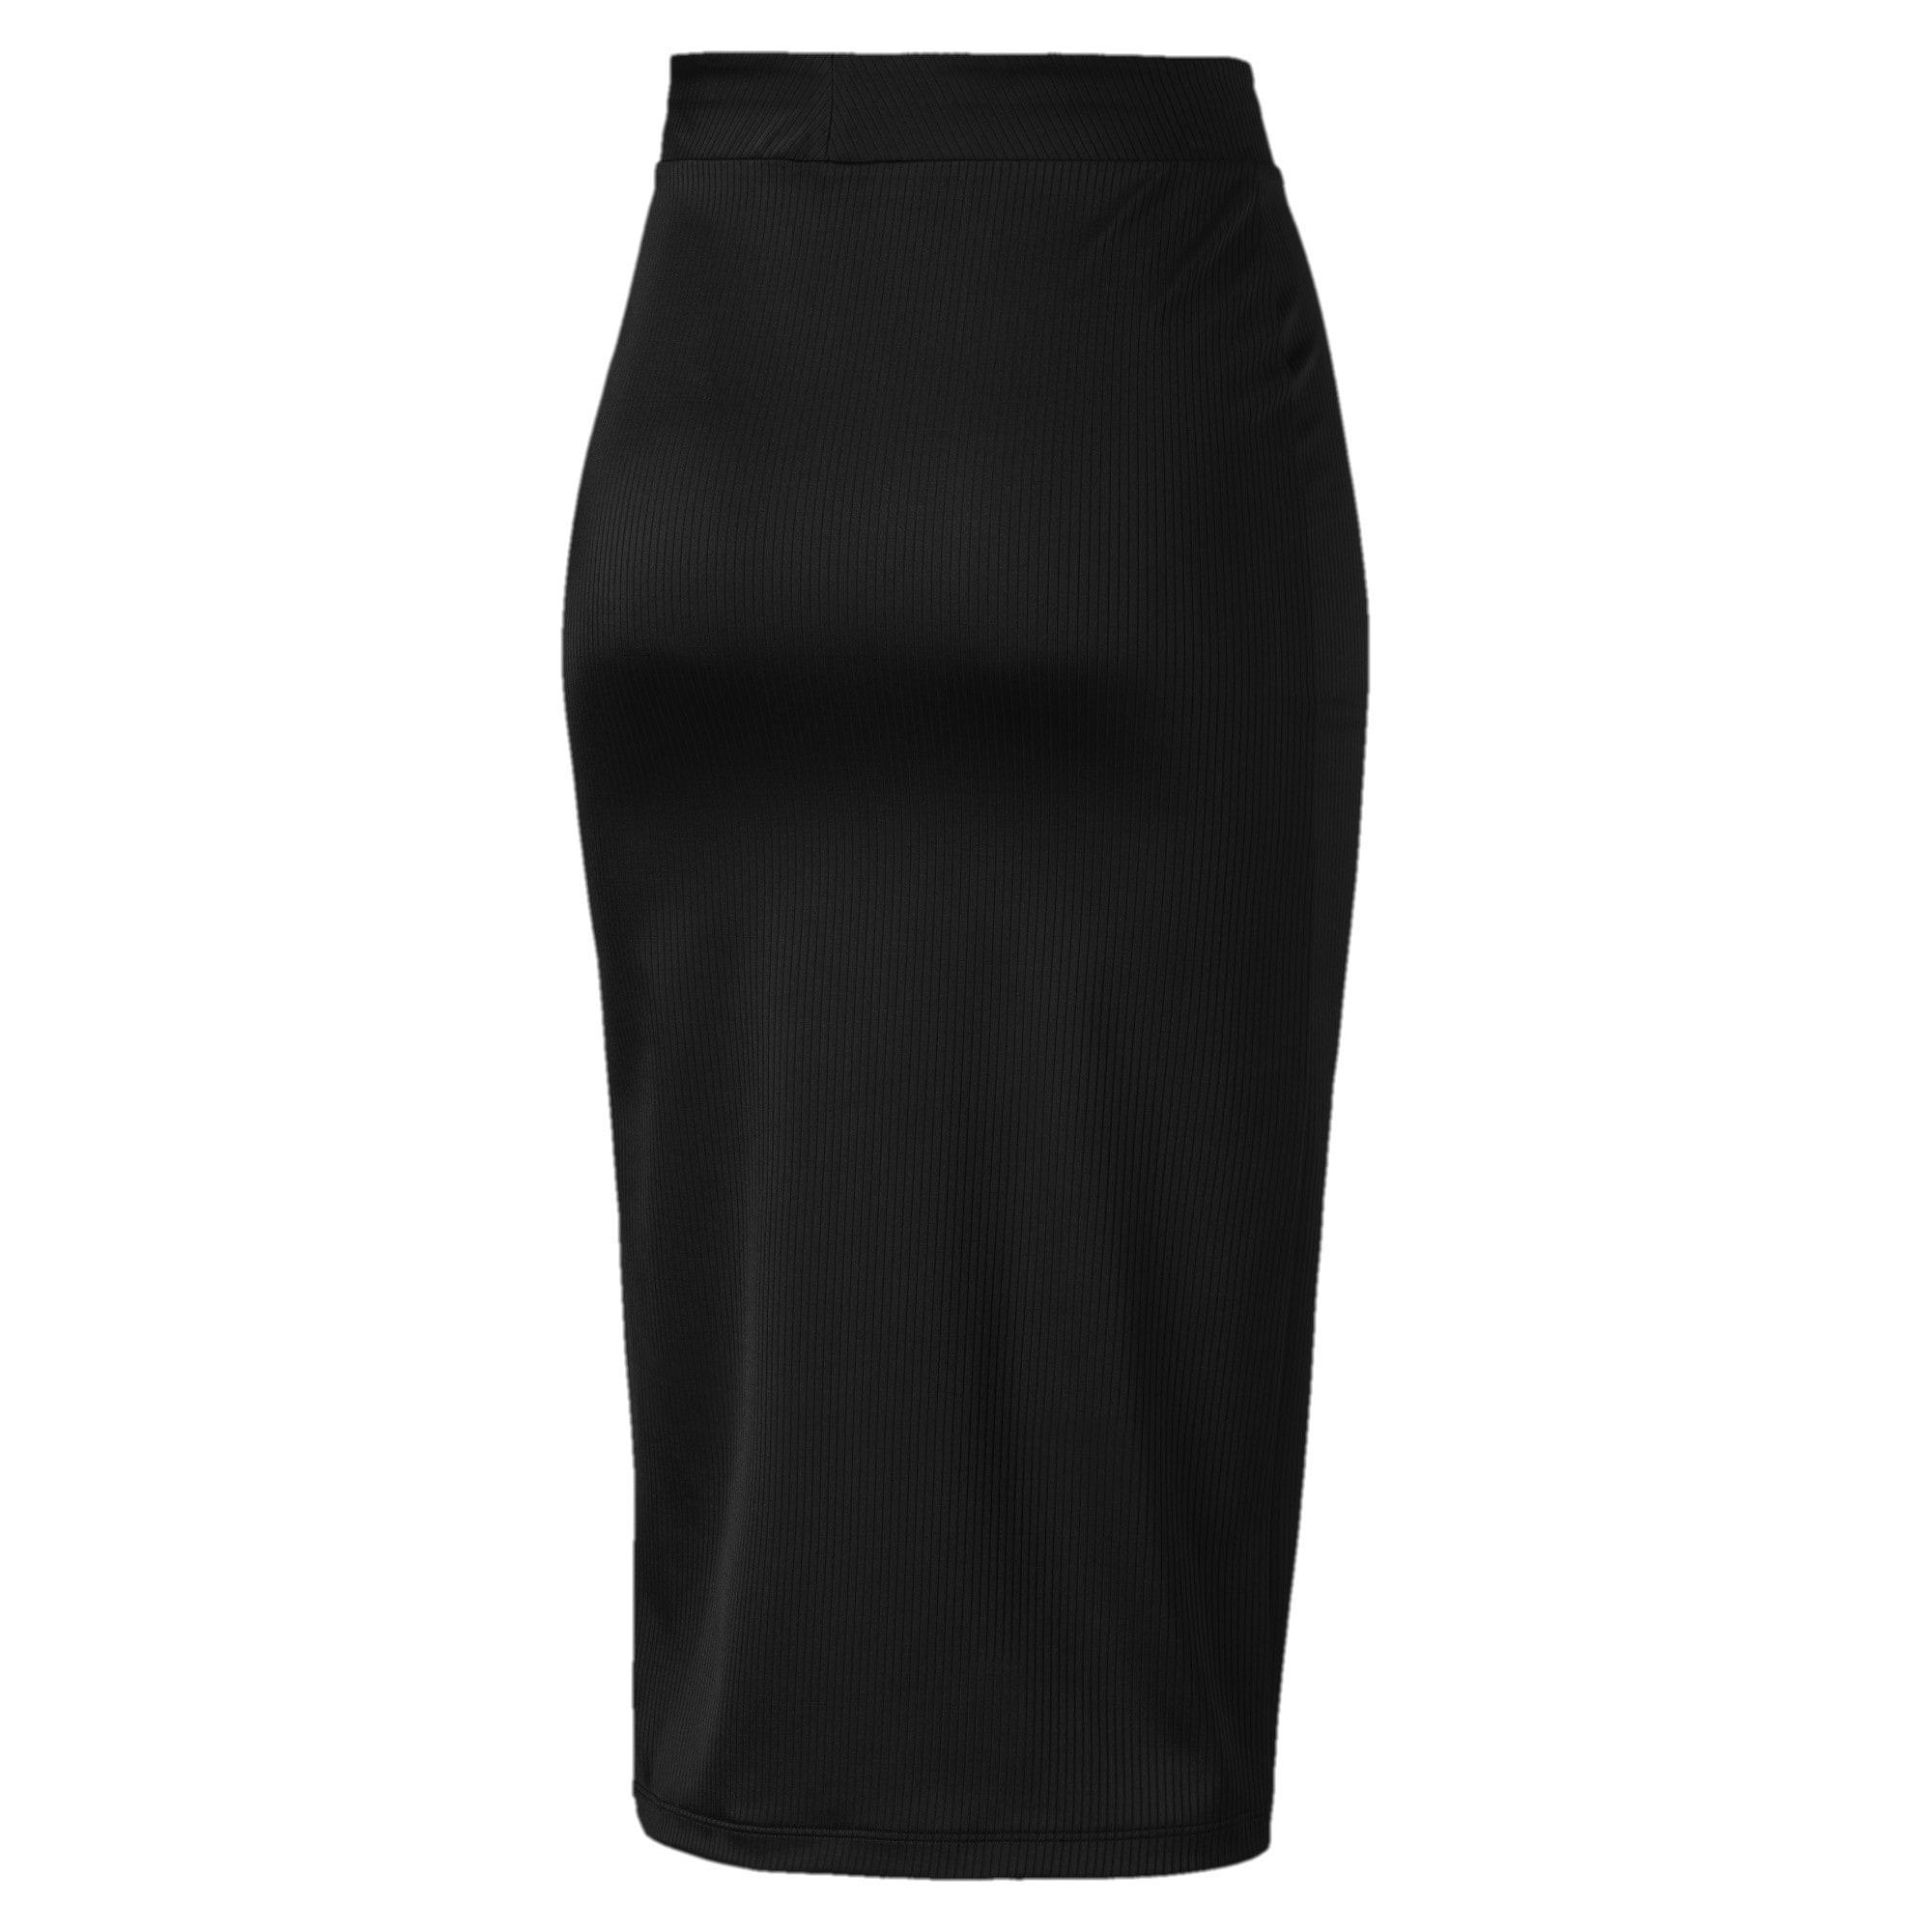 Thumbnail 5 of Classics Women's Skirt, Puma Black, medium-IND